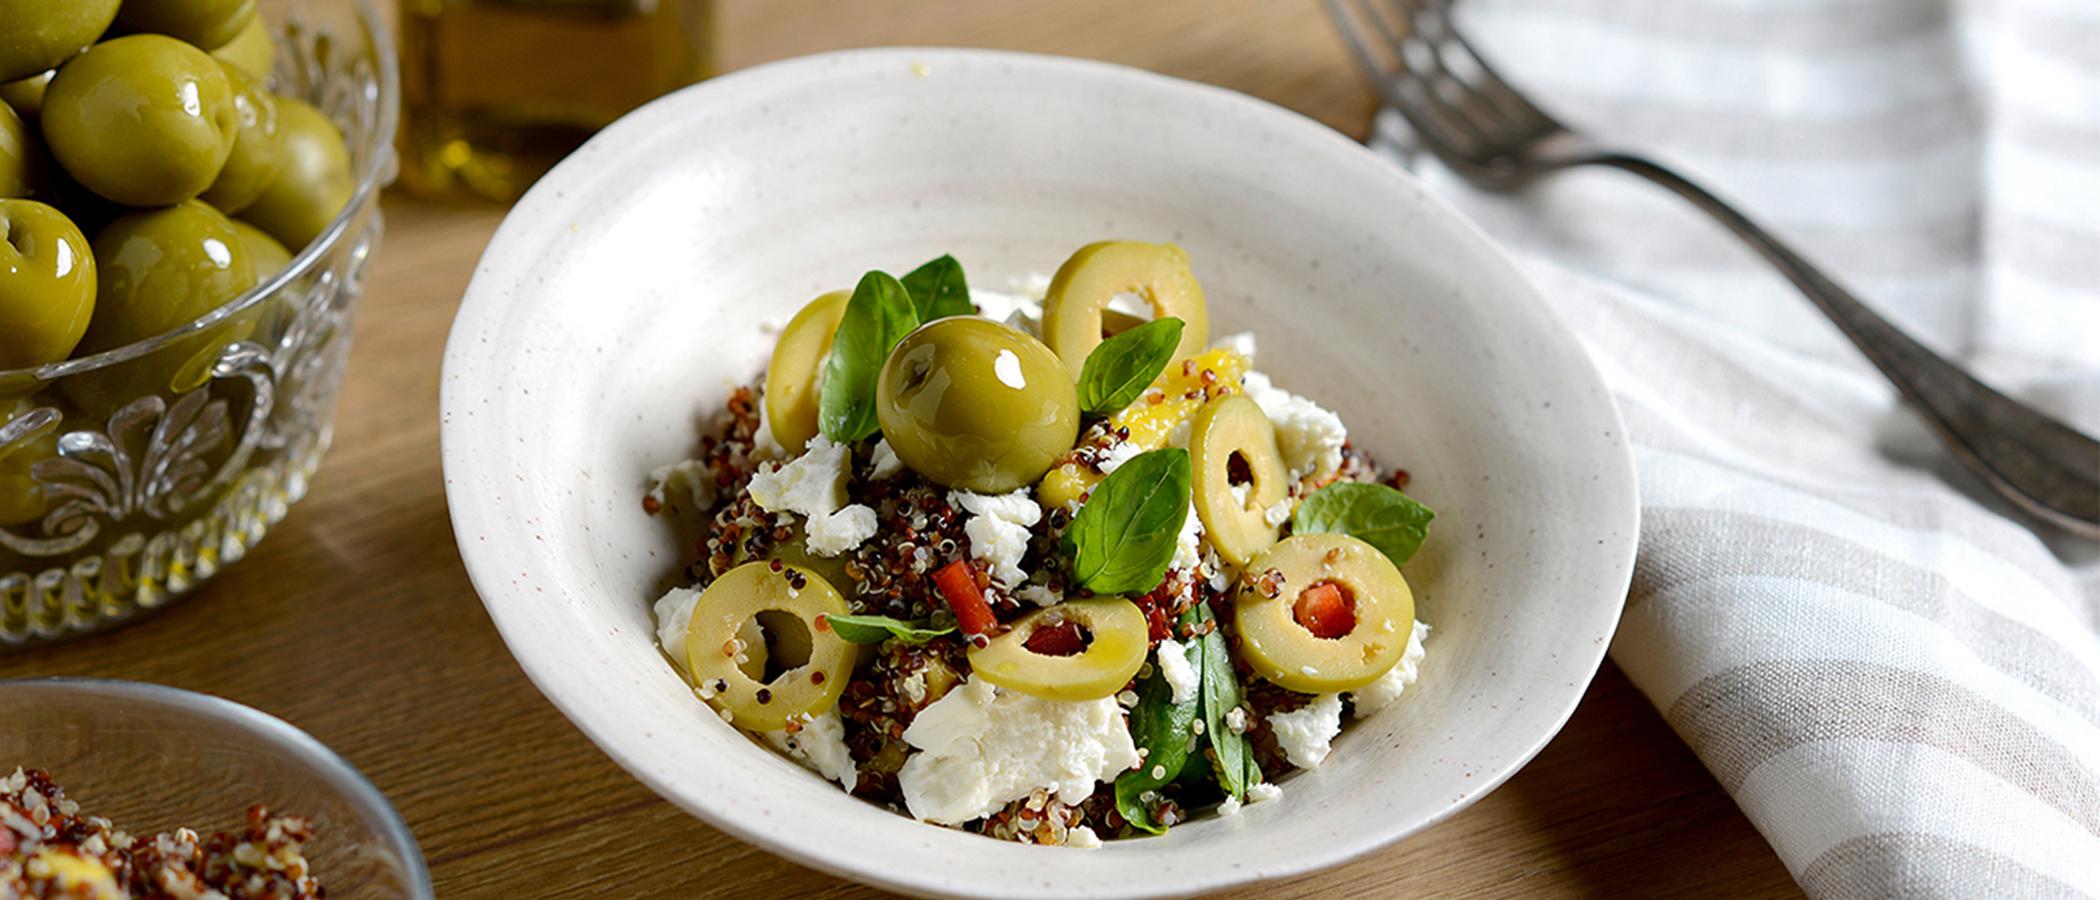 Olive and quinoa salad